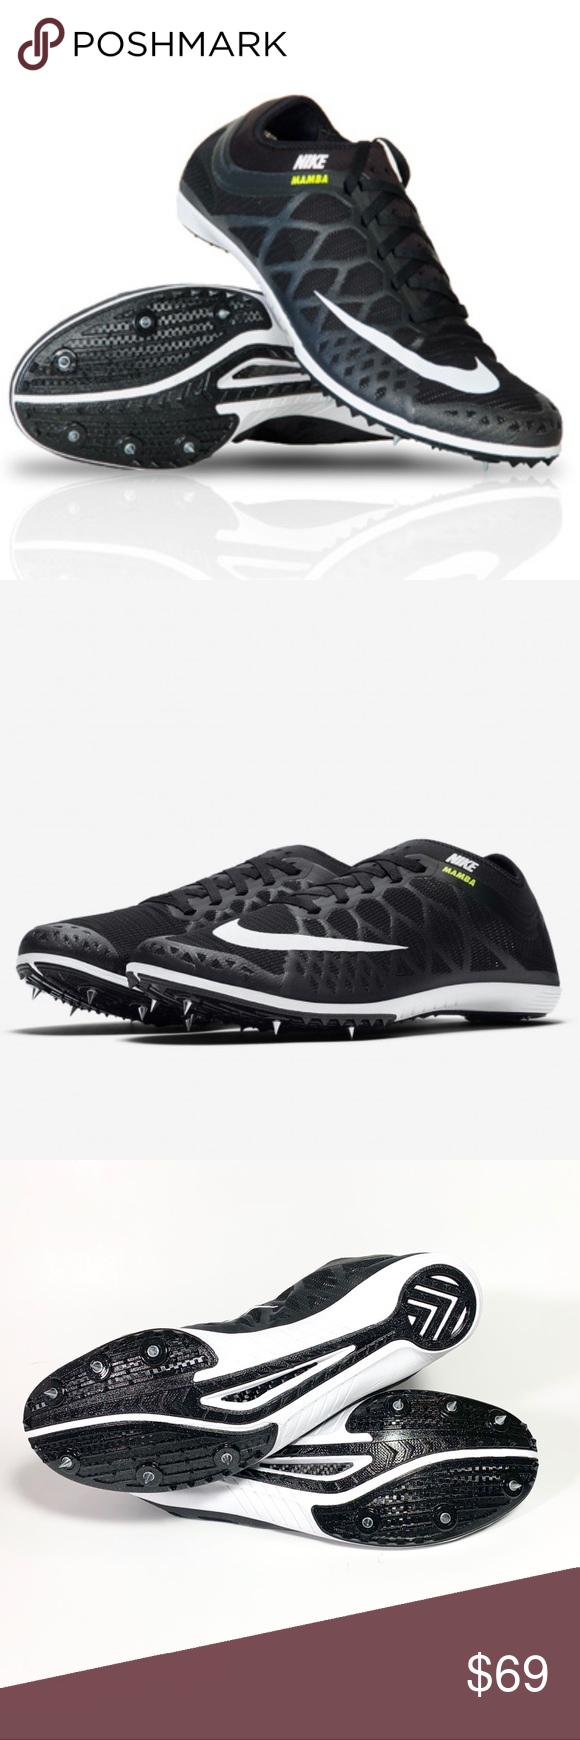 295c0976c2fa Nike Zoom Mamba 3 Distance Track Spikes Mens 11 New